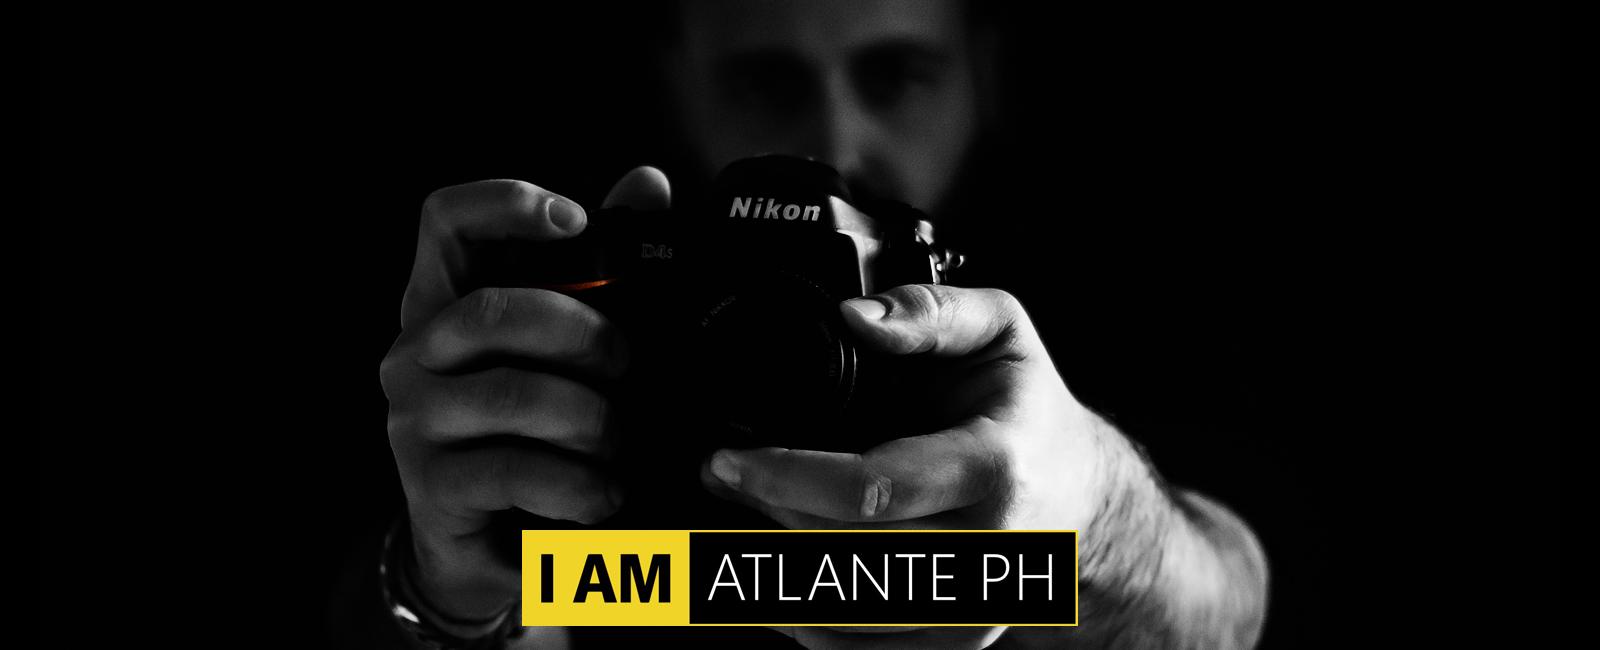 Atlante Ph